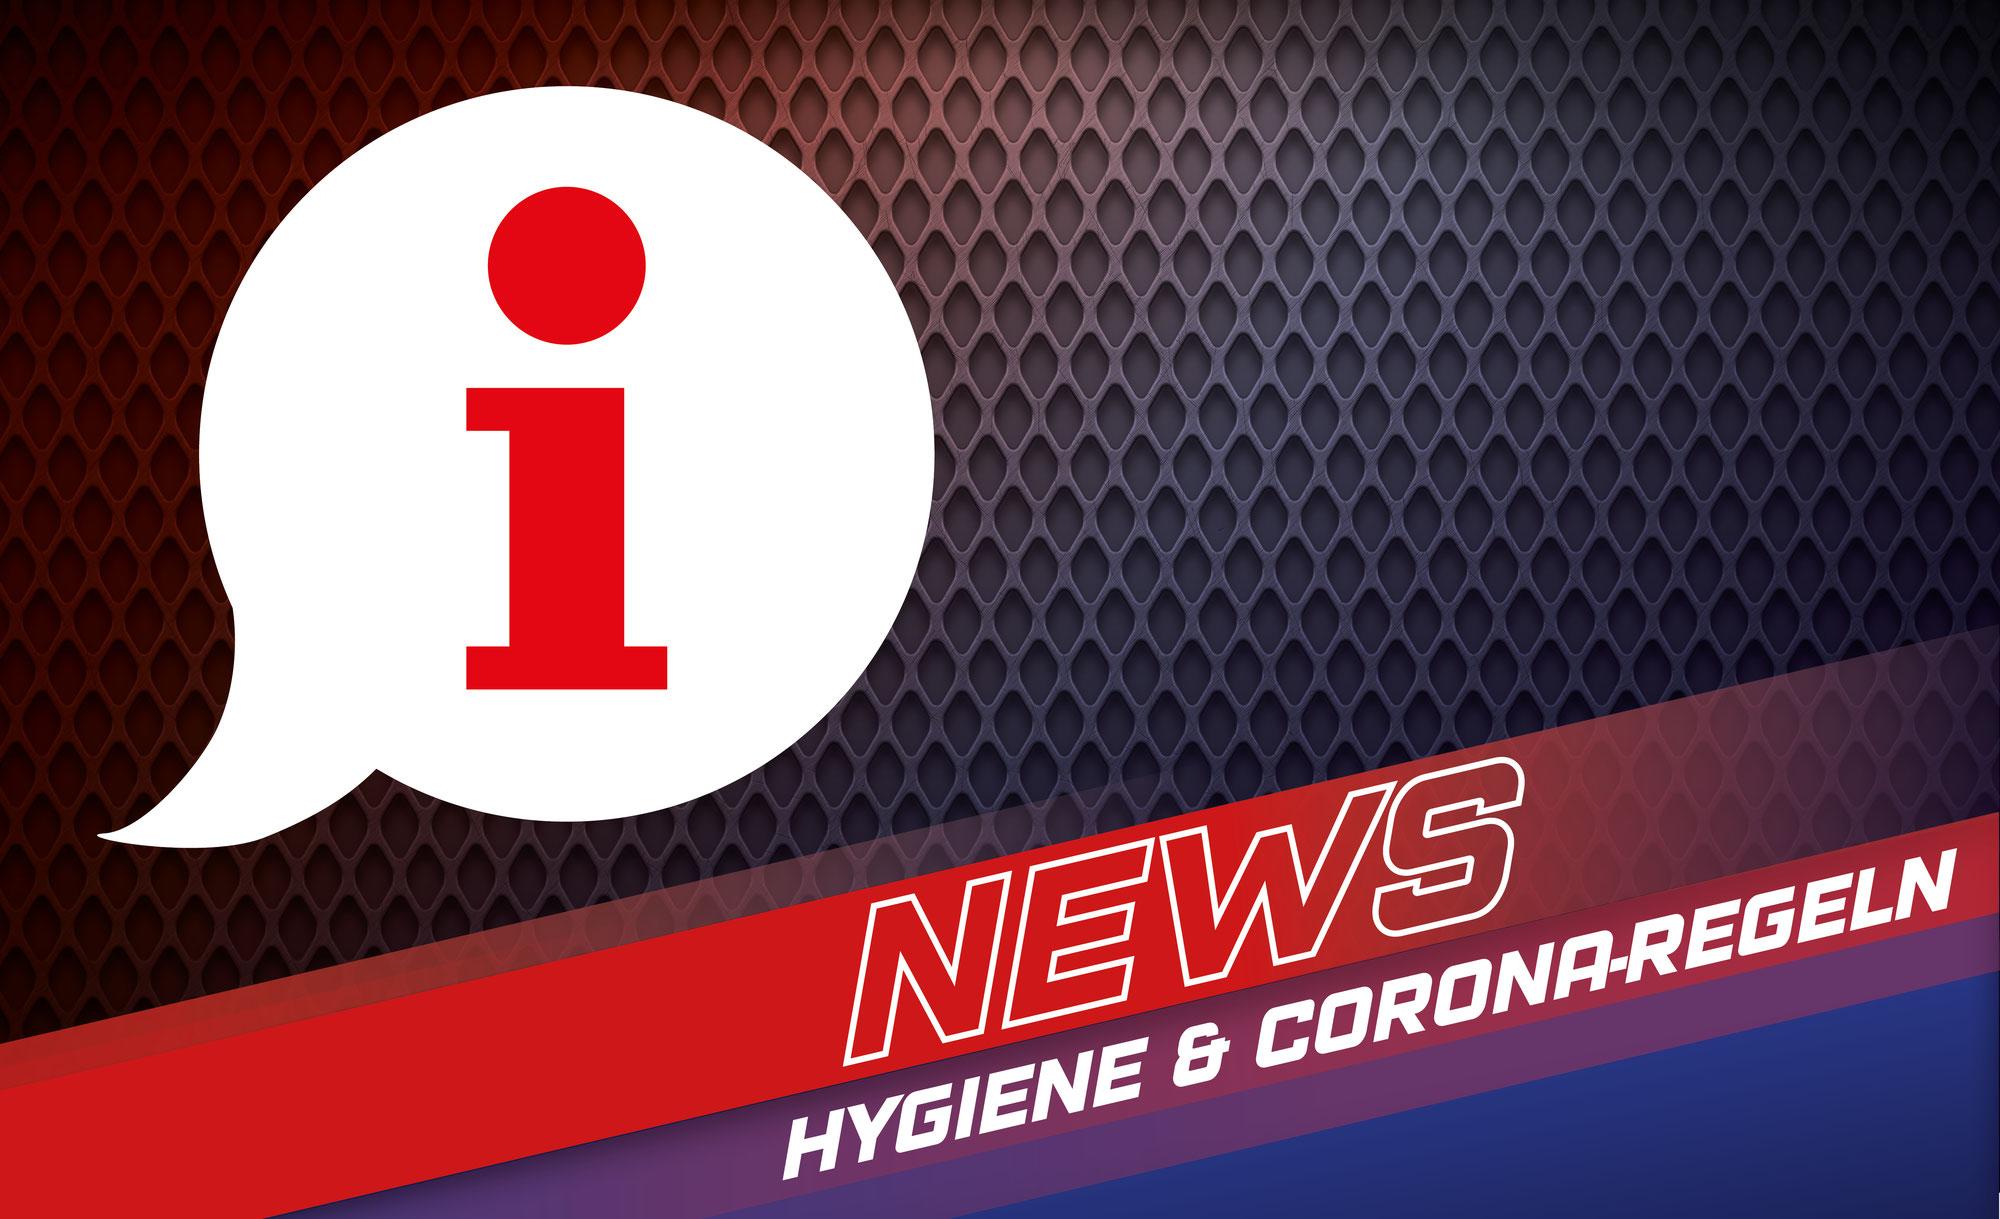 Corona-Regeln und Hygienemaßnahmen